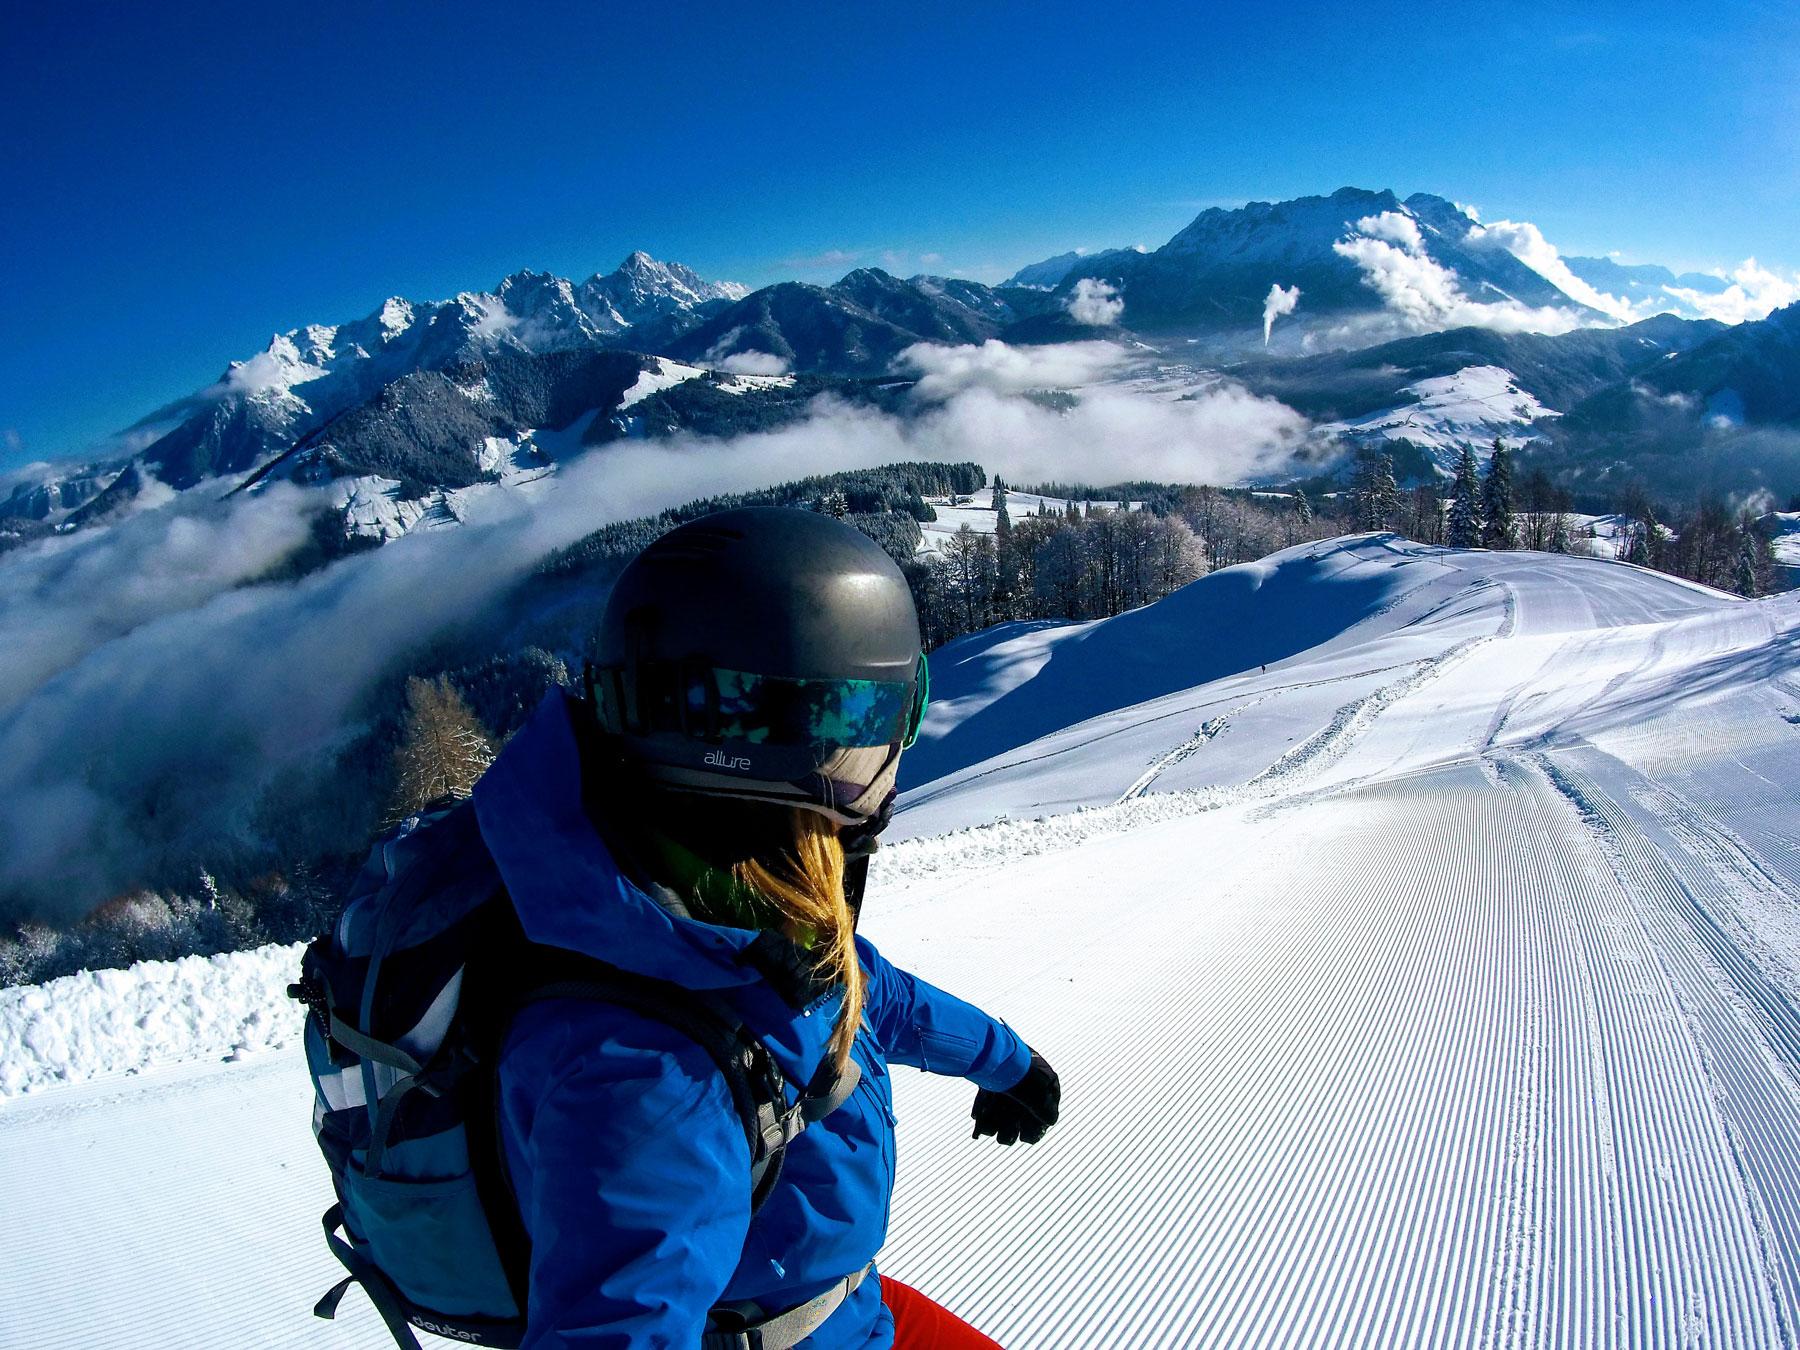 katharina-steglegger-munichmountaingirls-bergblog-muenchen-snowboarden-fieberbrunn